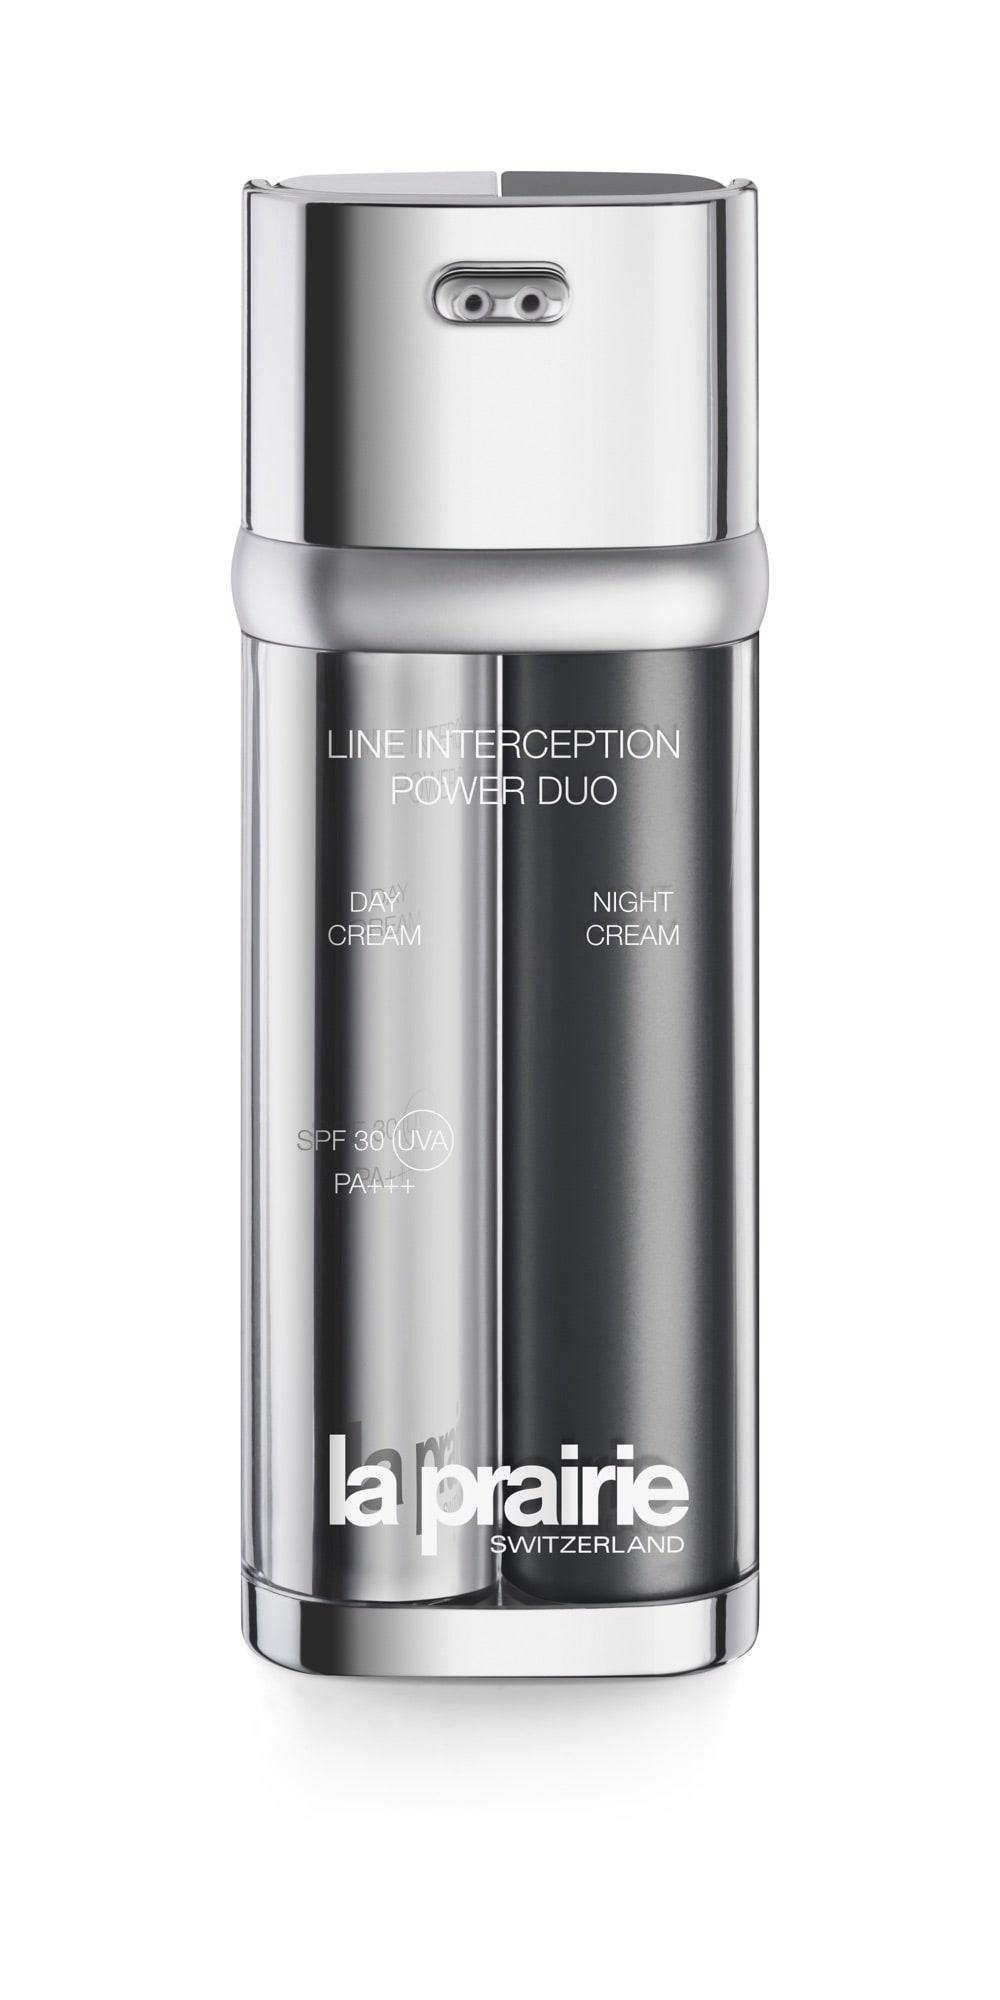 LaPrairie_LineInterceptionPowerDuo